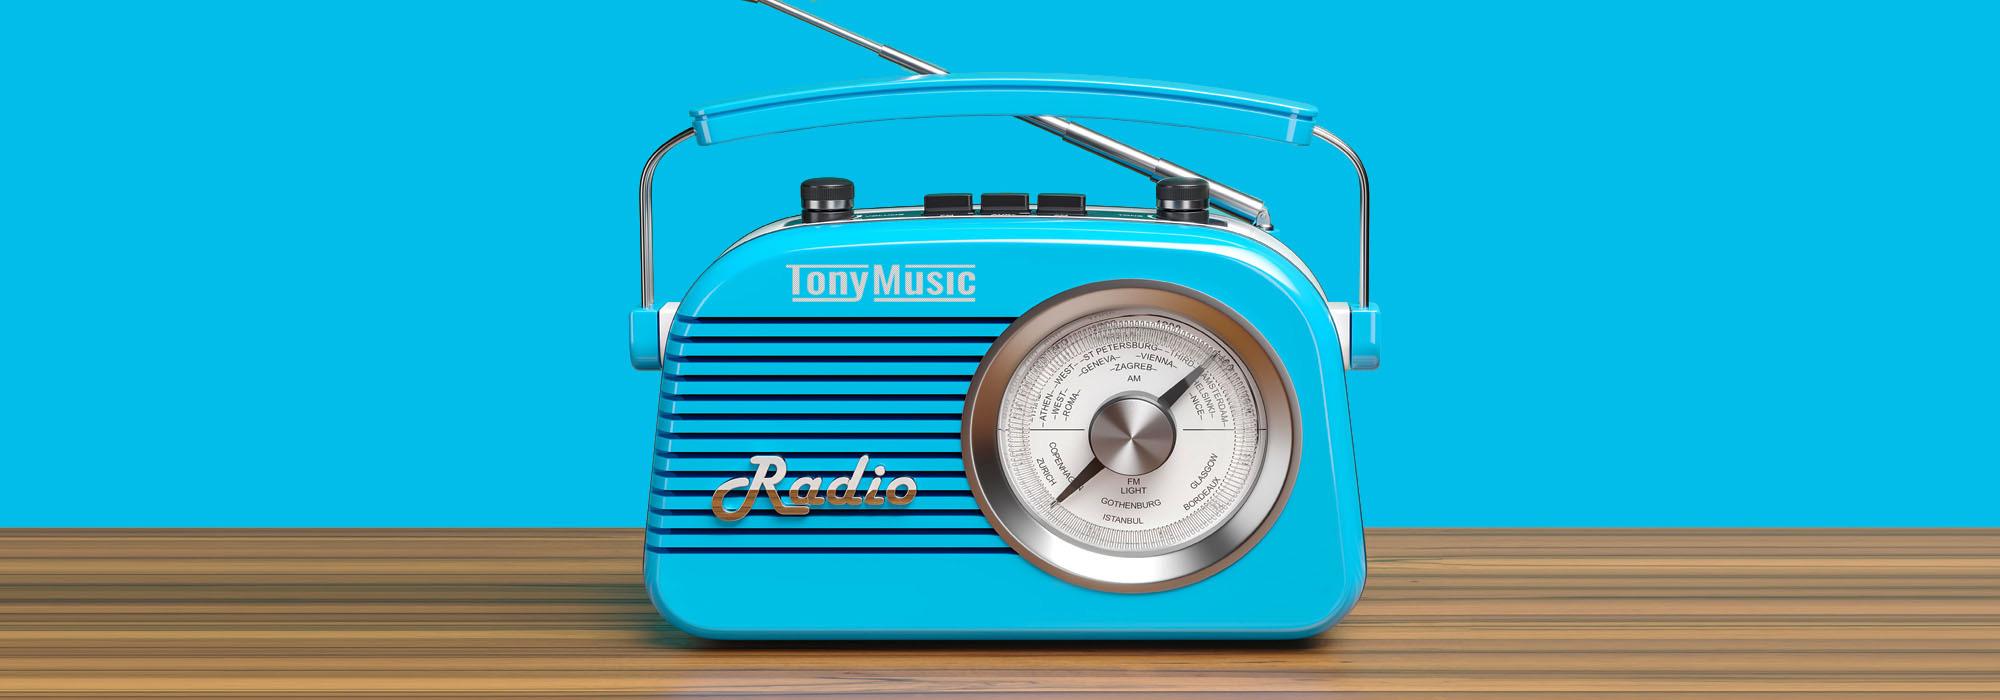 radio-top-bg